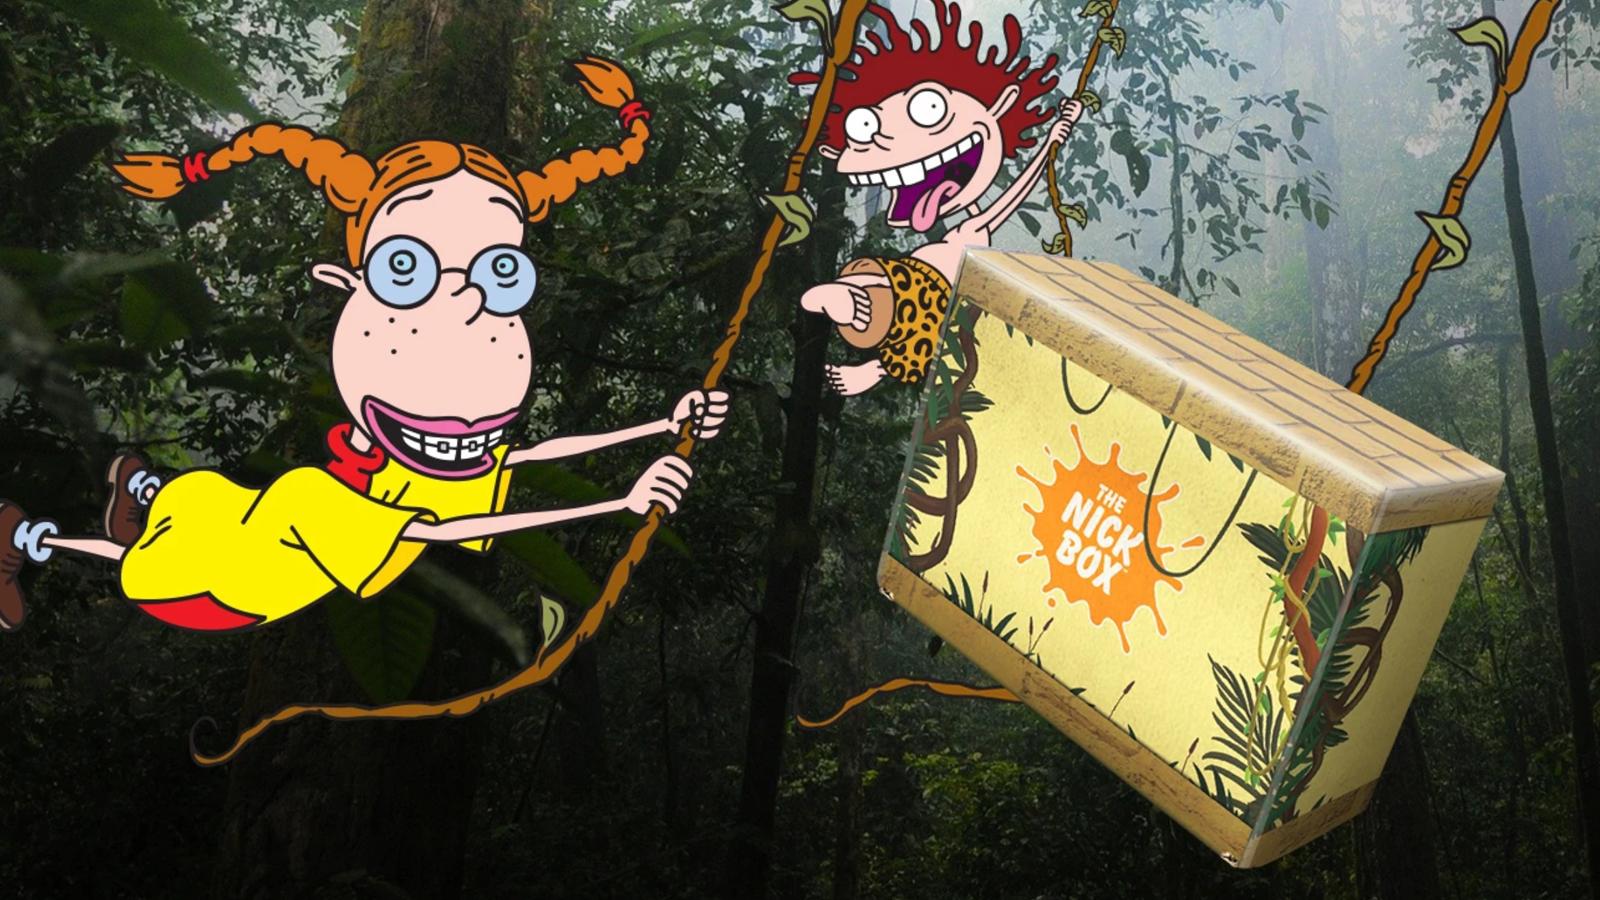 The Nick Box next to popular Nickelodeon characters